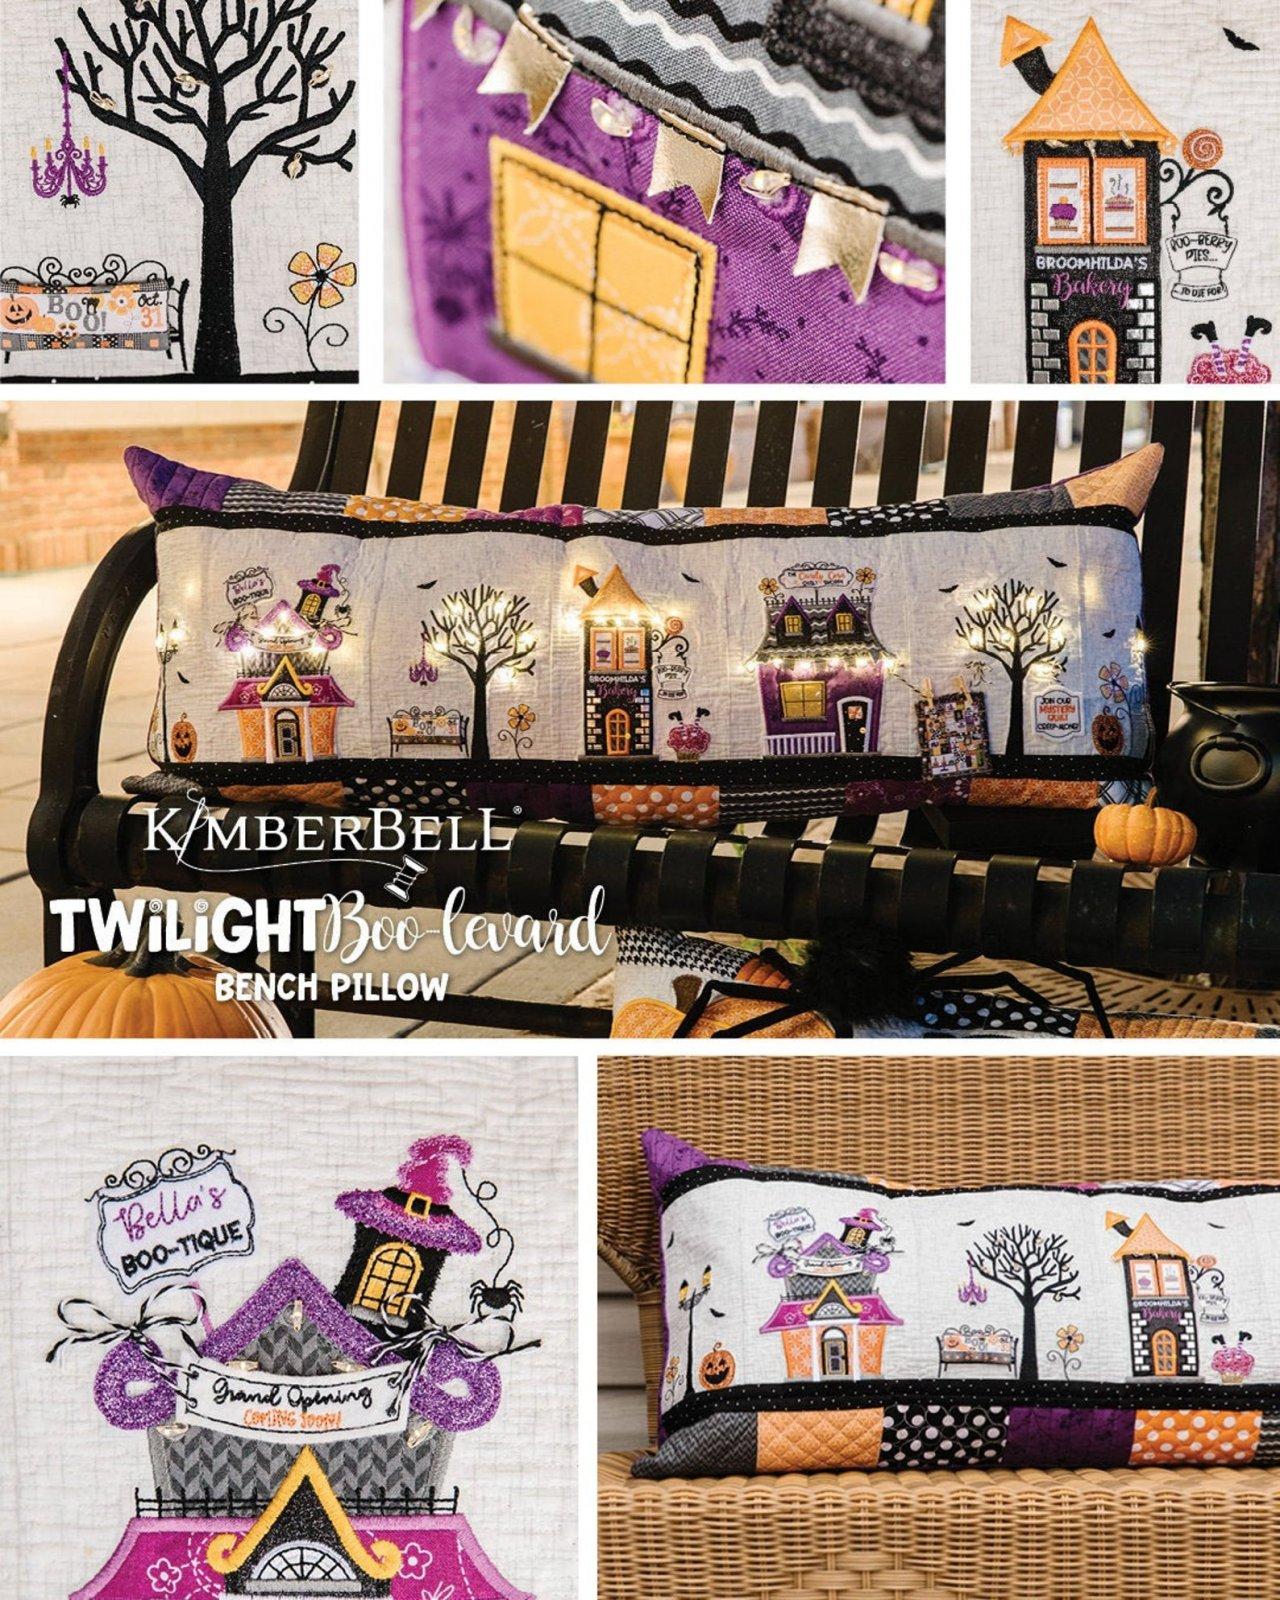 Twilight Boo-levard